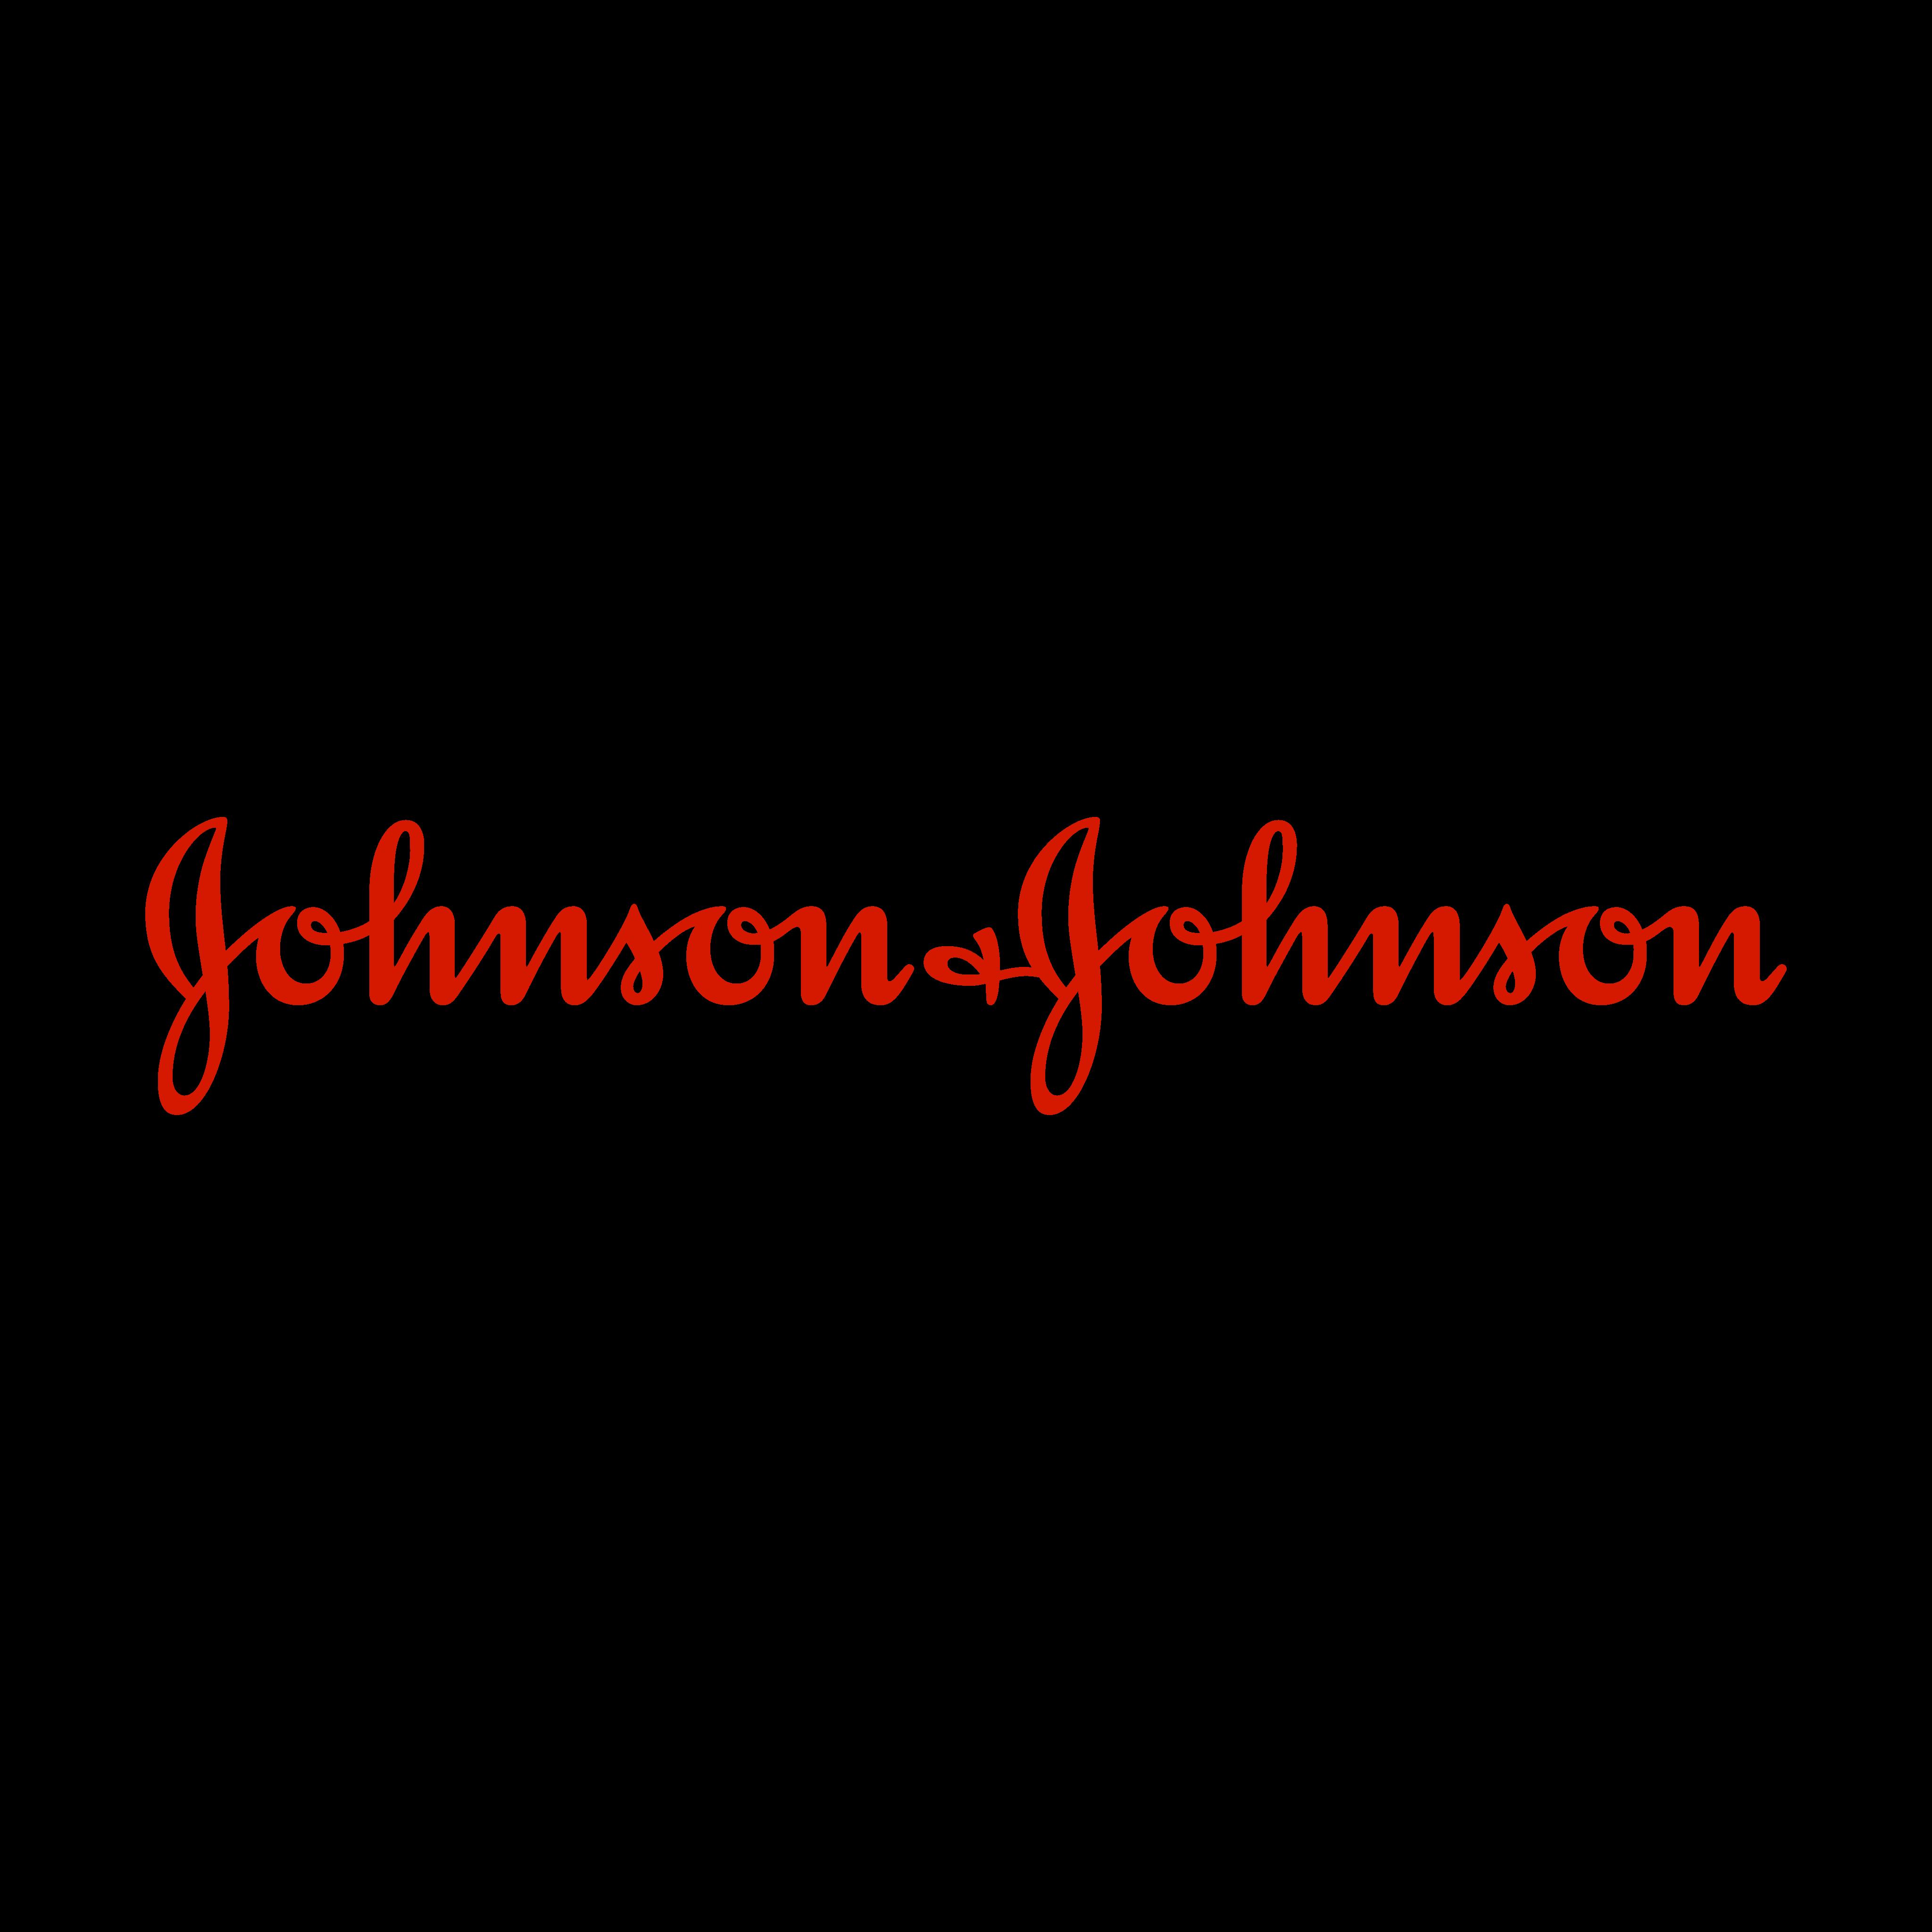 johnson johnson logo 0 - Johnson & Johnson Logo